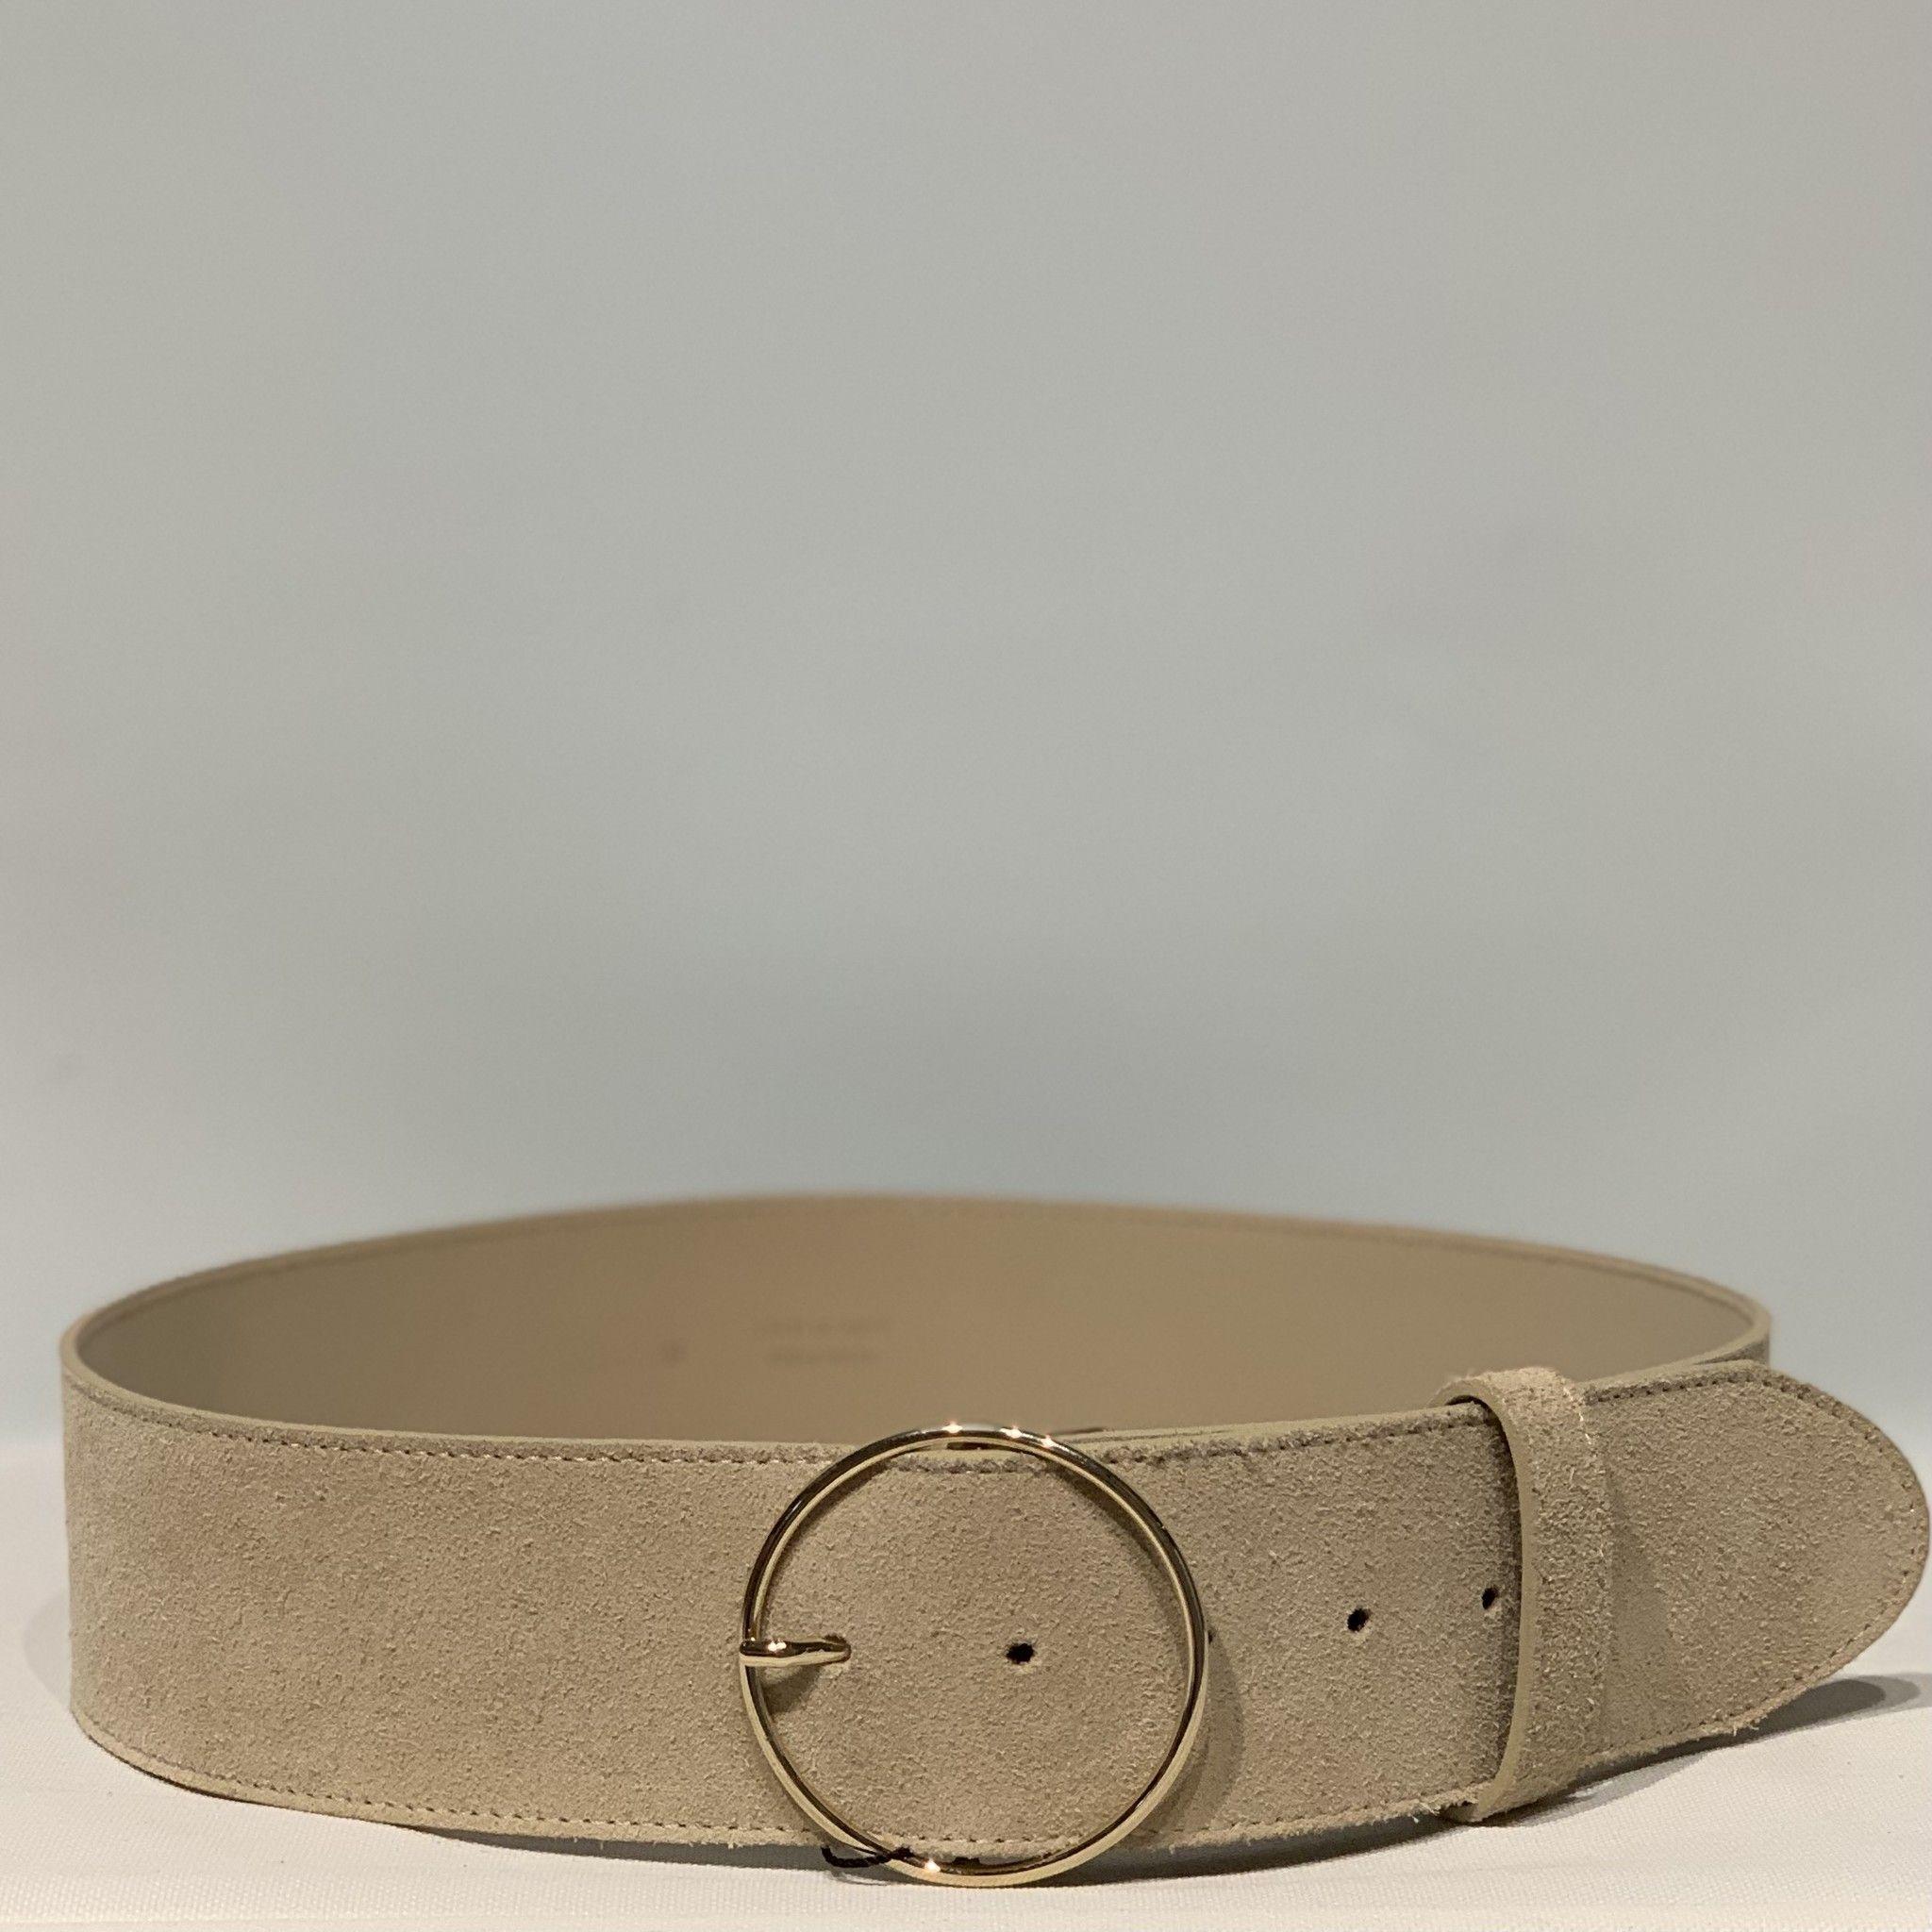 Cintura camoscio PELLETTERIA G4